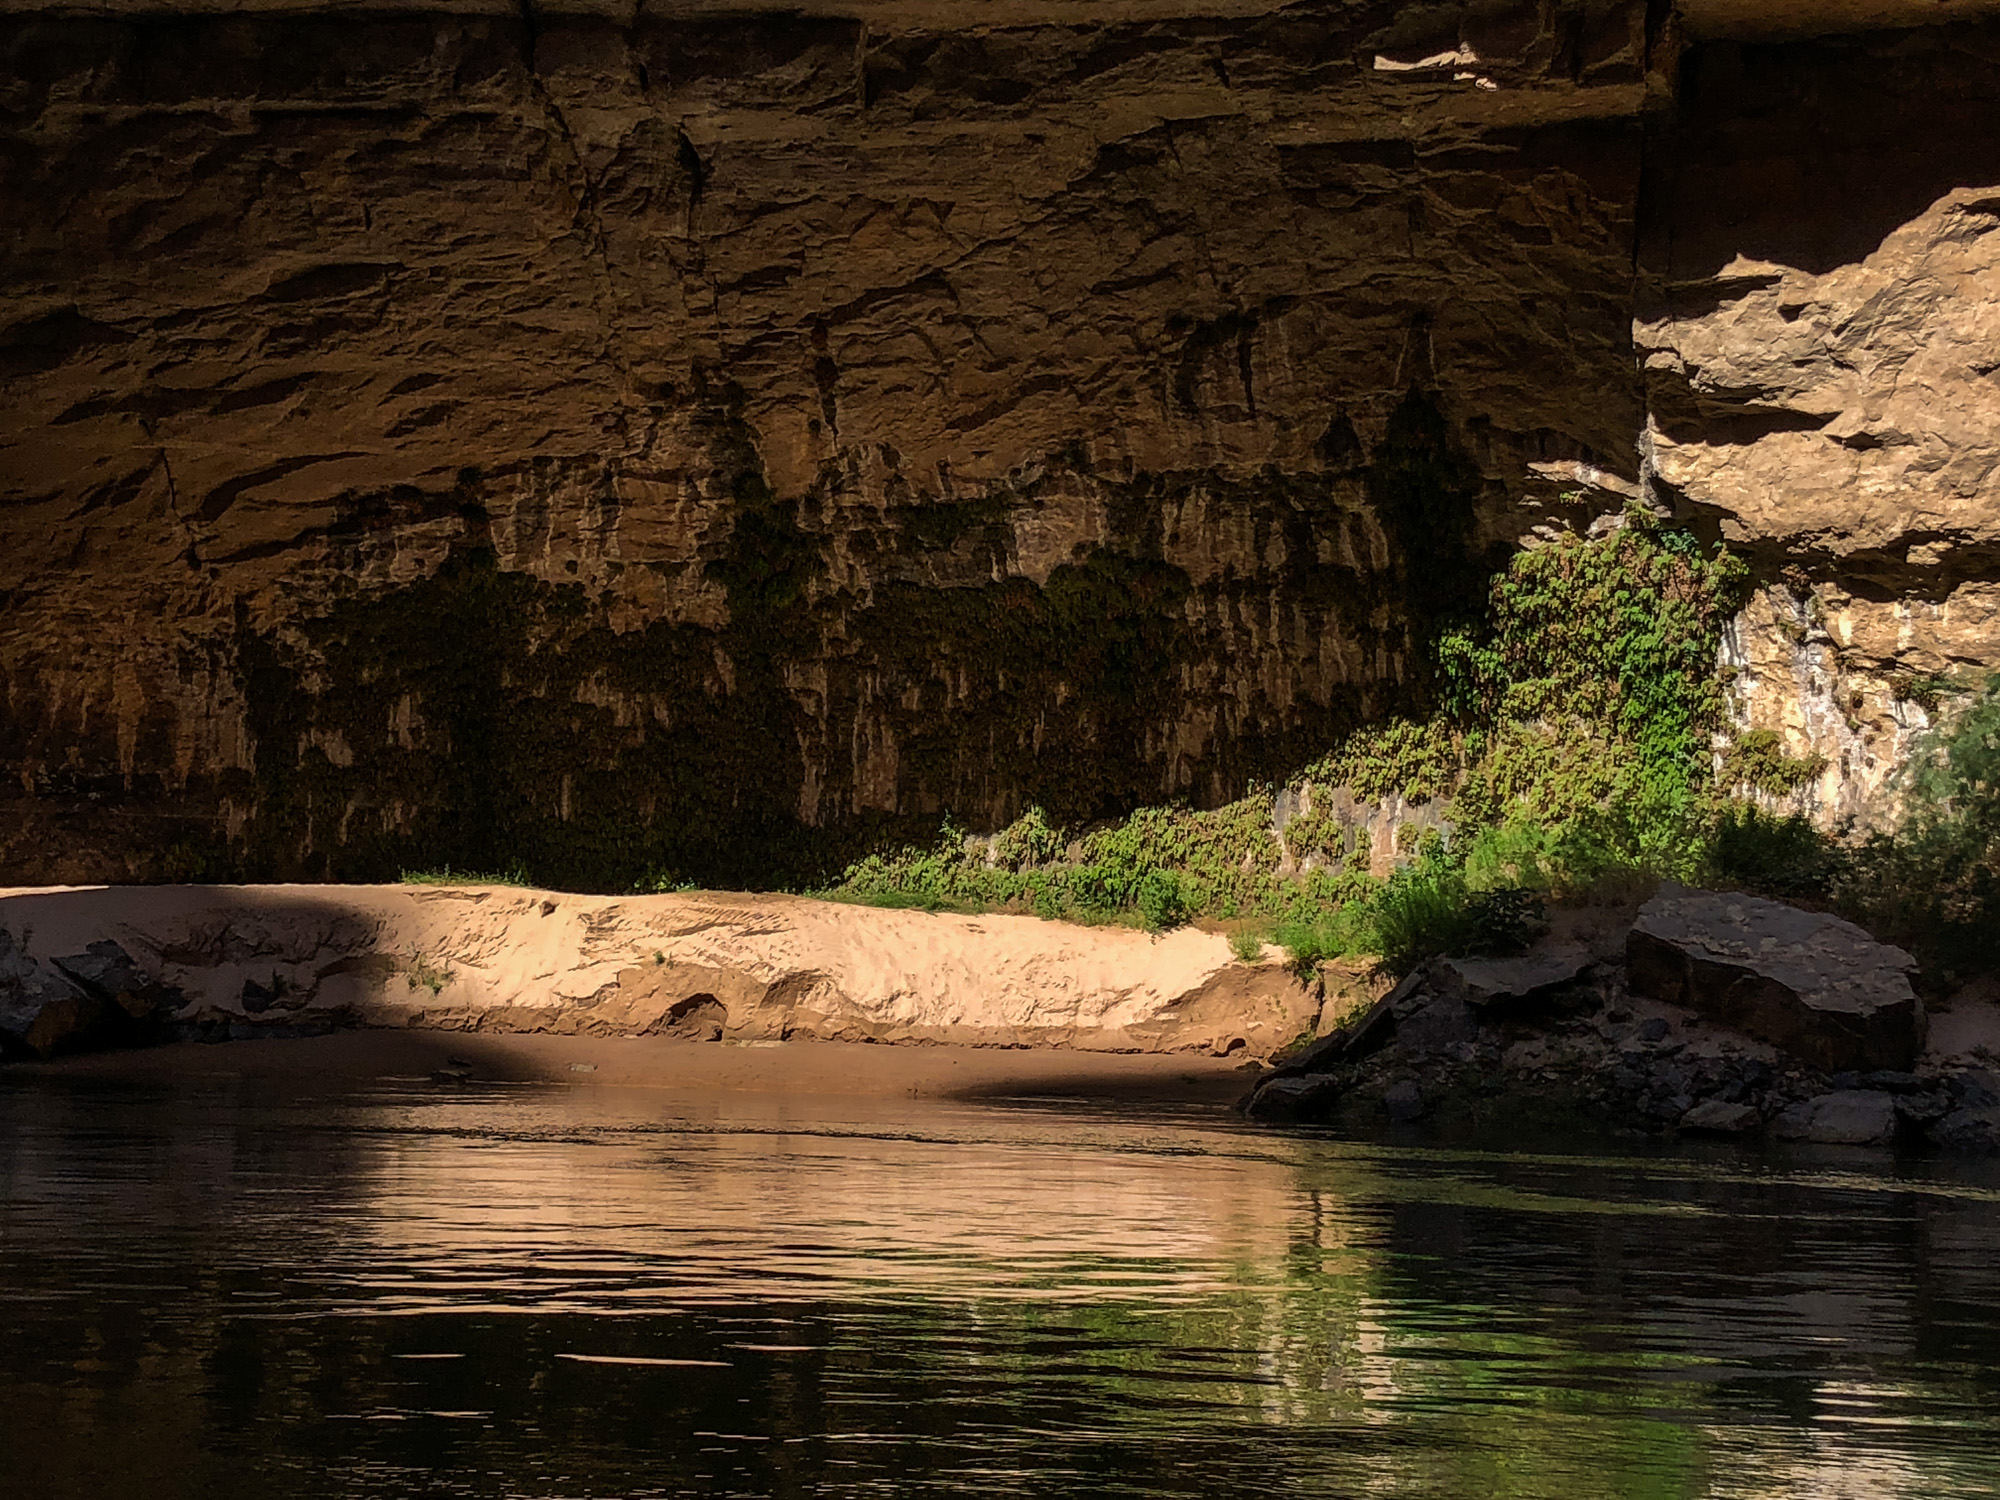 The Colorado River inside the Grand Canyon